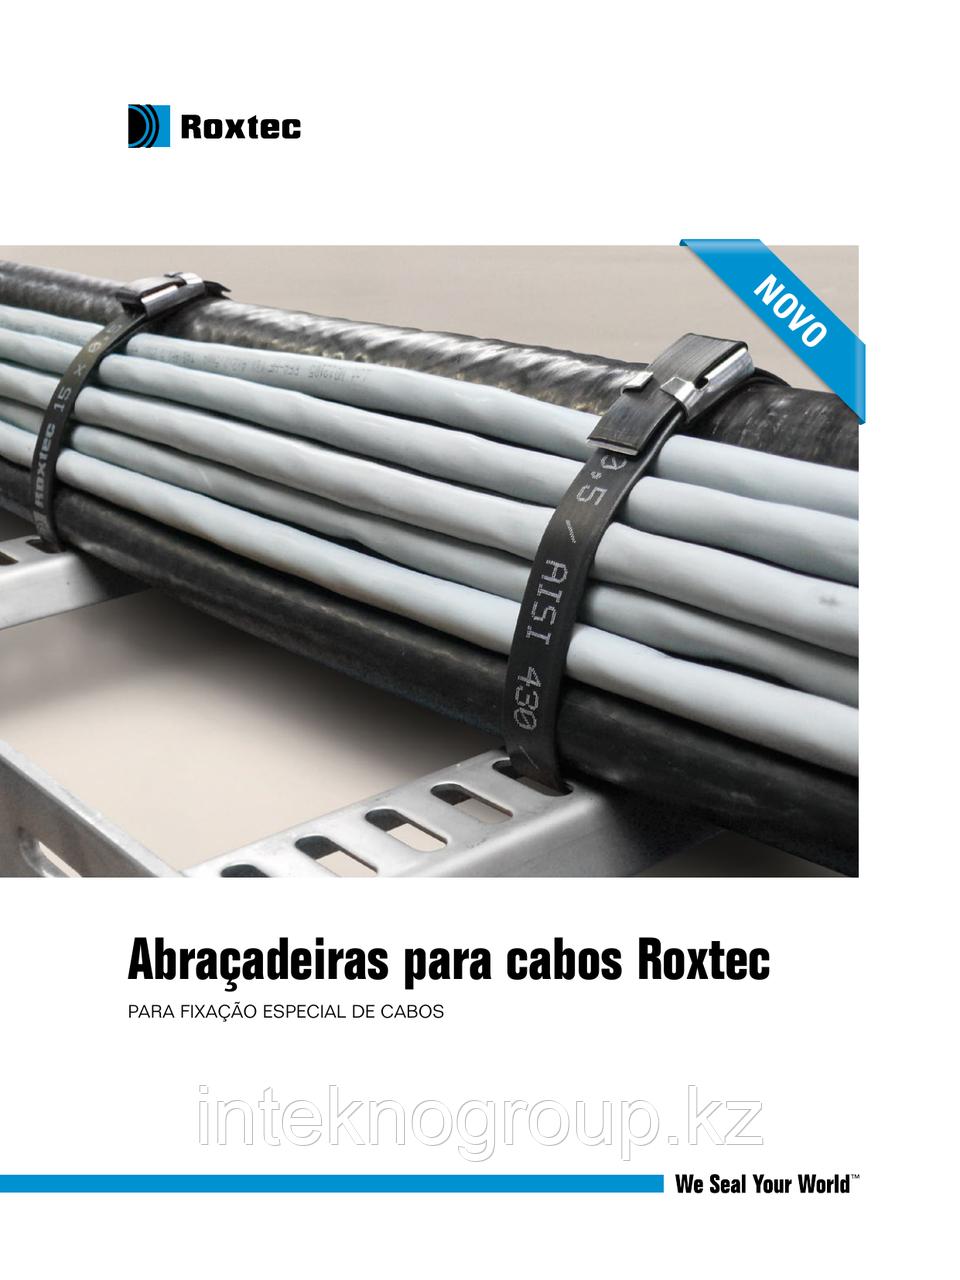 Roxtec Cable straps Strap 15x0,5 grey/galv. L=400 mm